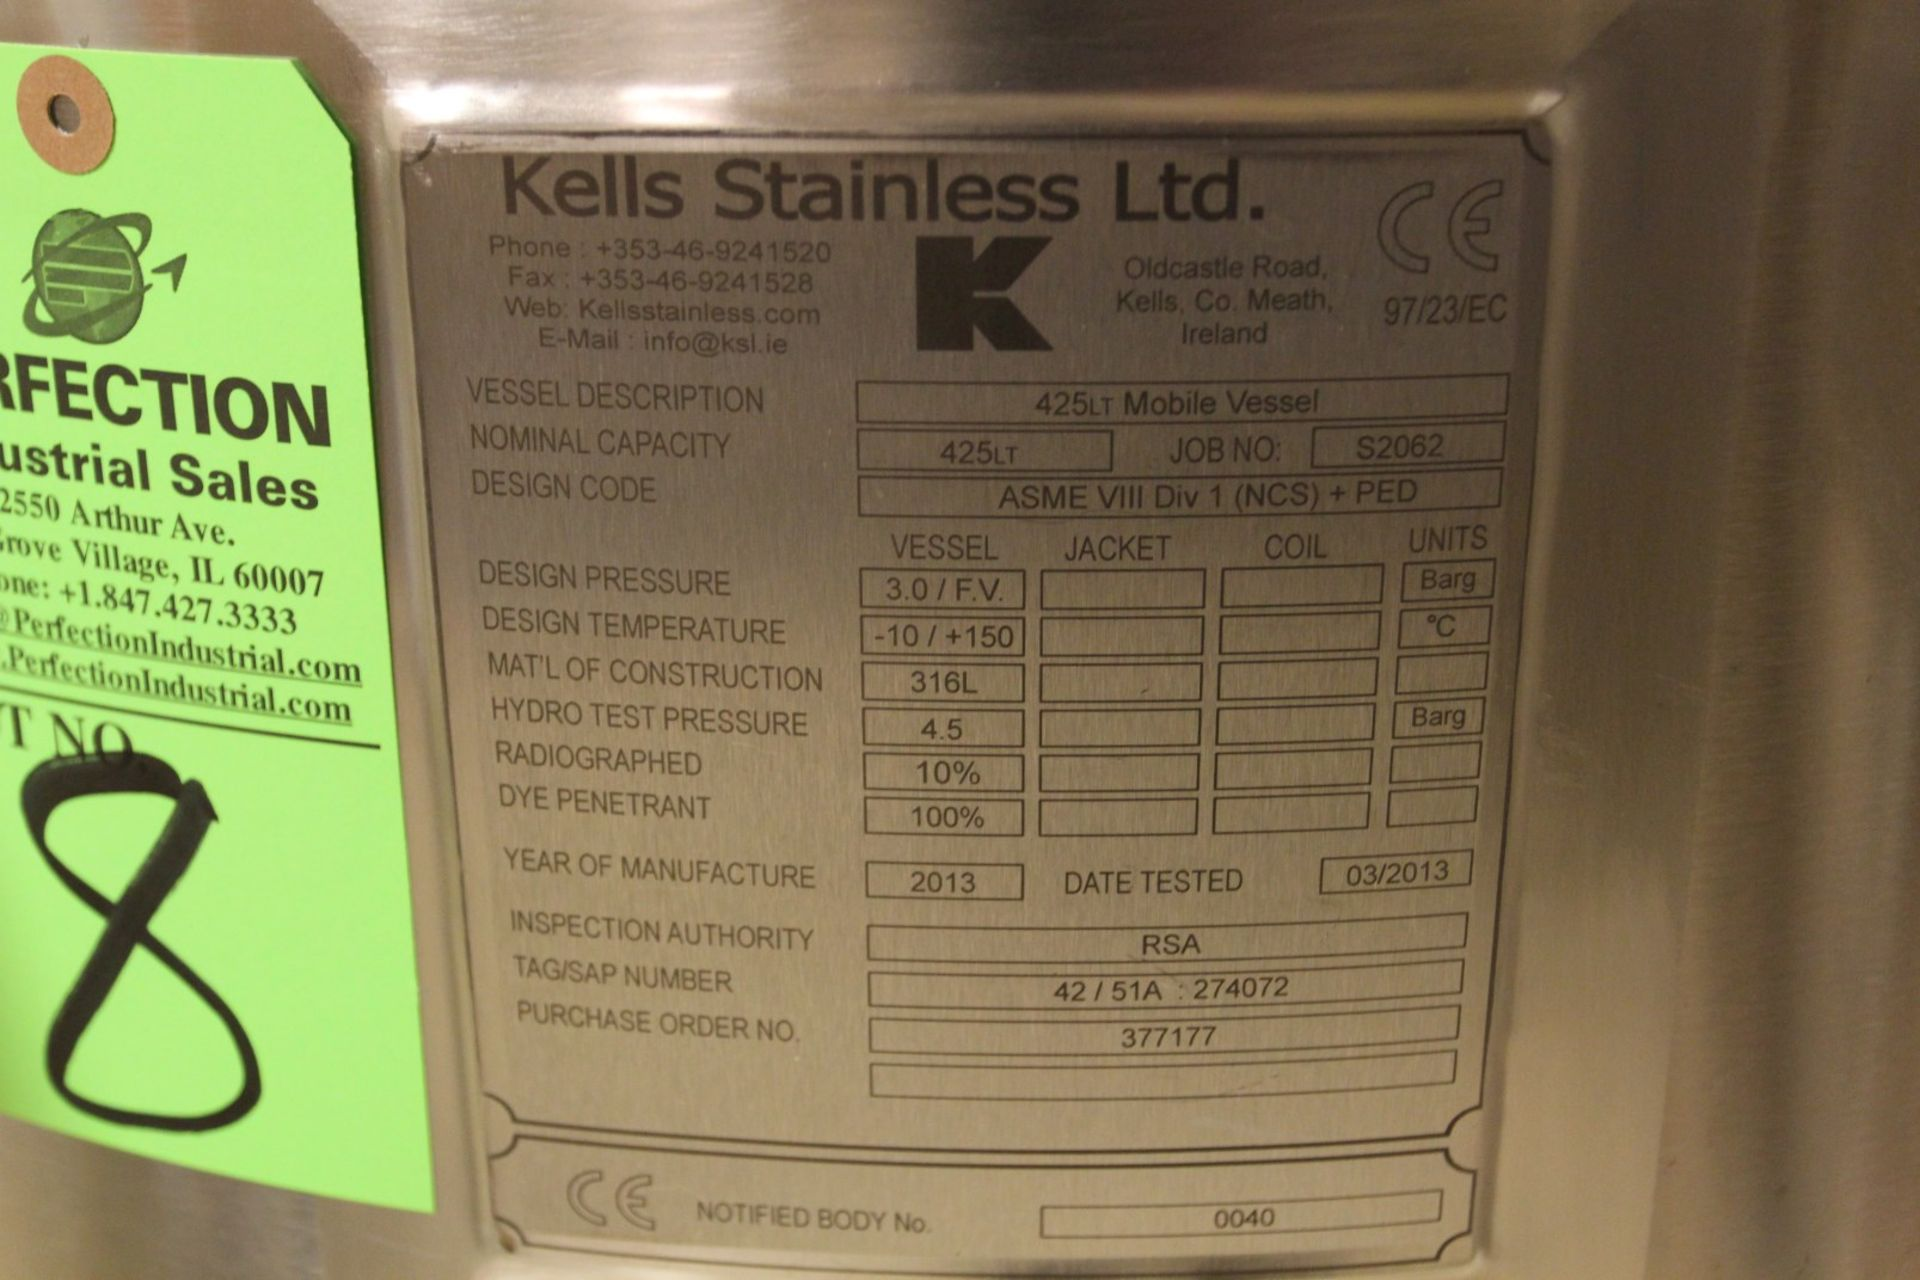 Lot 8 - 2013 Kells Stainless 425LT Mobile Vessel, Job No S2062, 425 Liter Capacity, 316L Stainless Steel